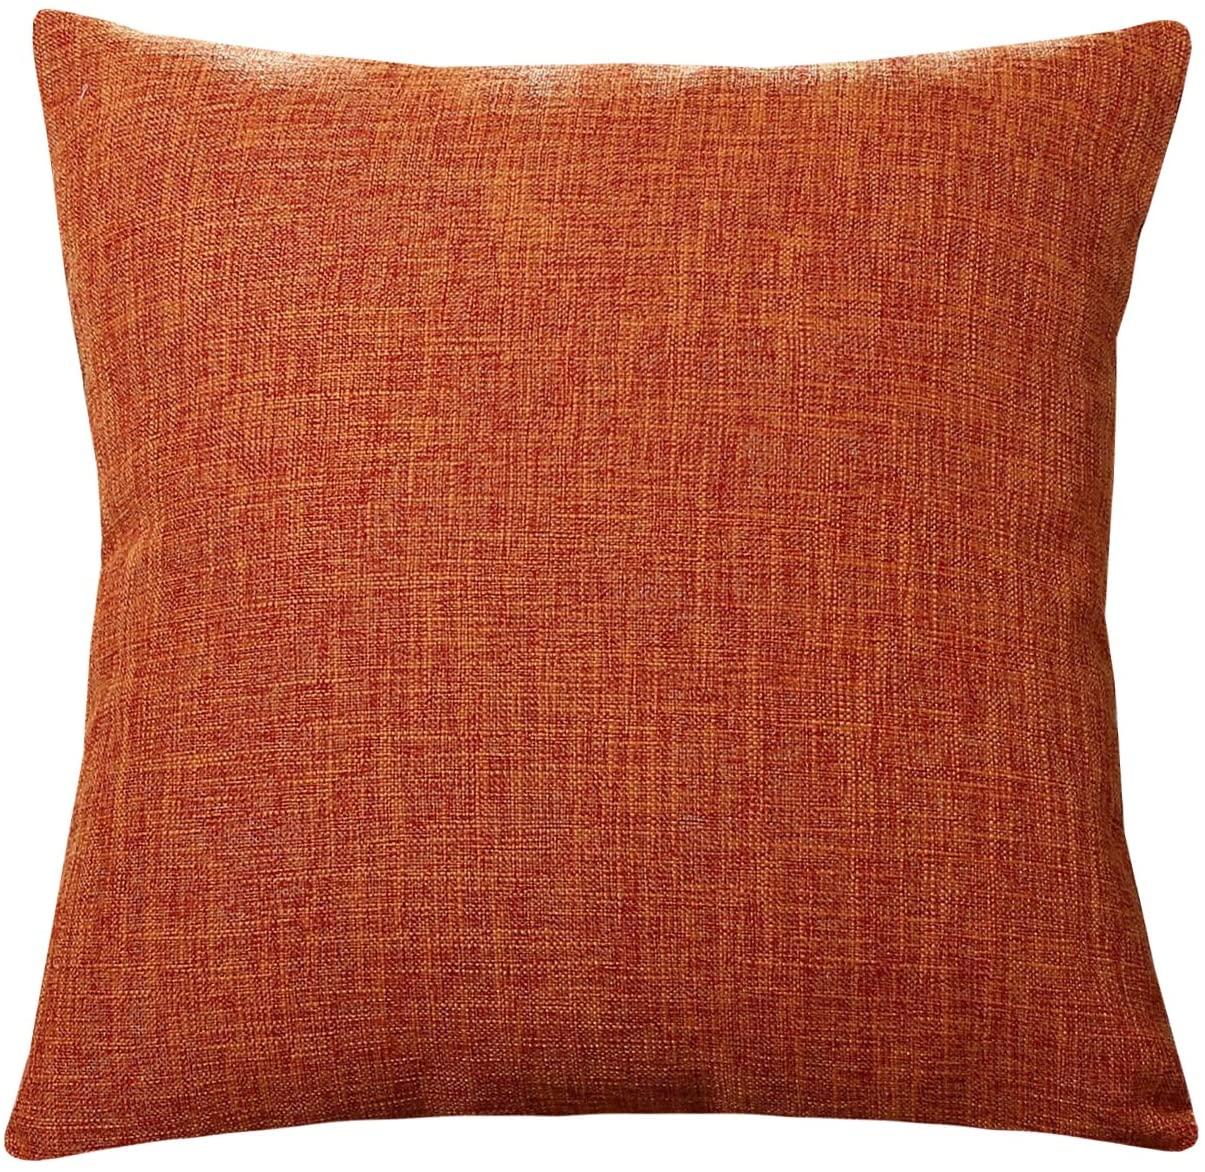 UArtlines Pillowcase Covers, Slubbed Linen Orange Pillow Case Decorative Cushion Cover Pillowcase for Sofa Pillow Cover